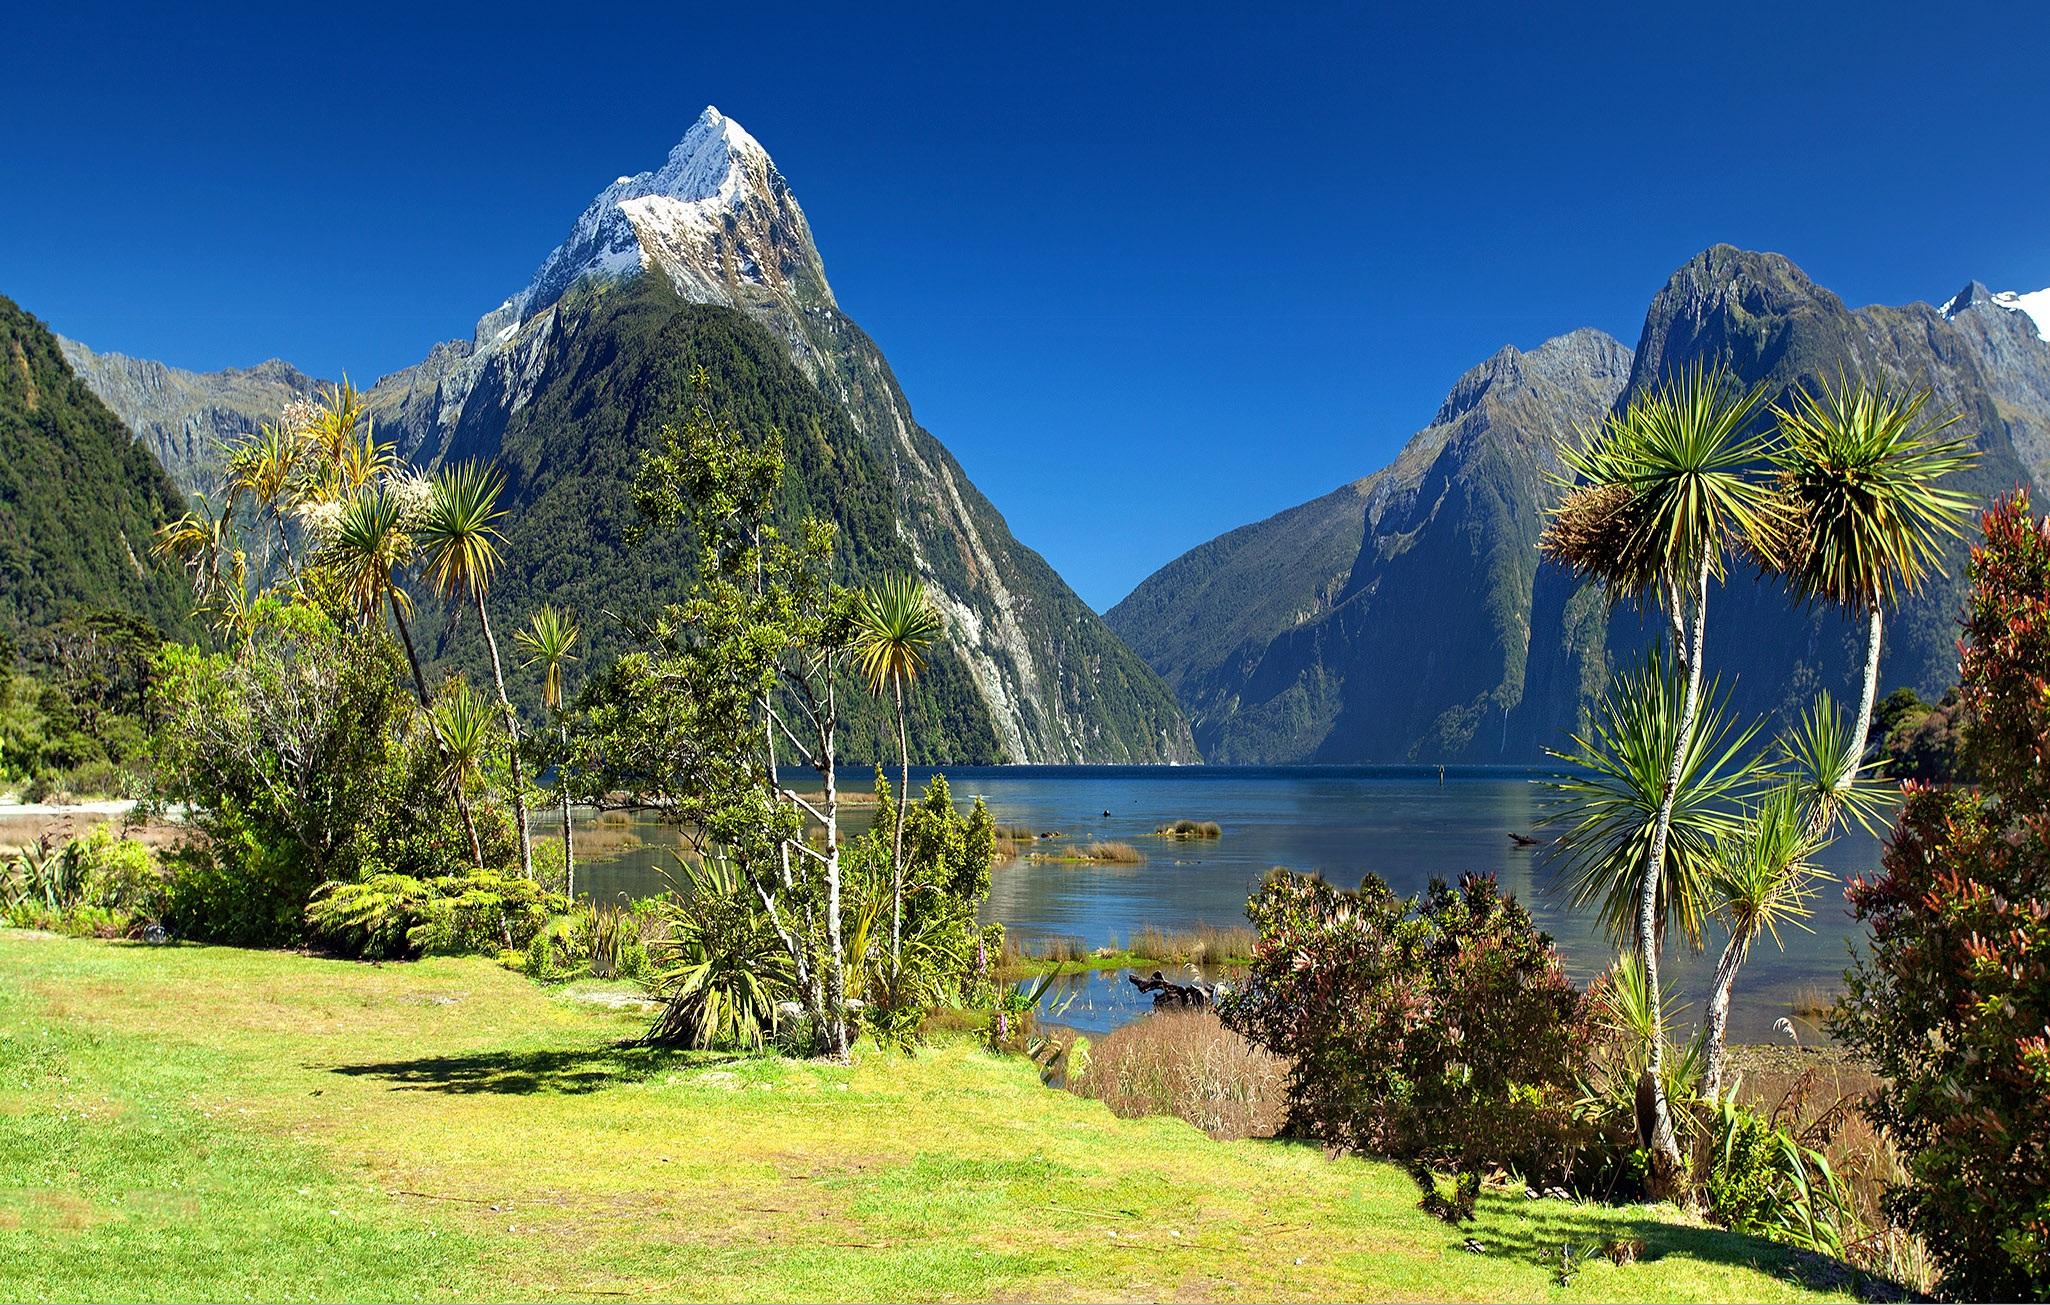 15-Top-Rated-Travel-Destination-Bucketlist-Must-See